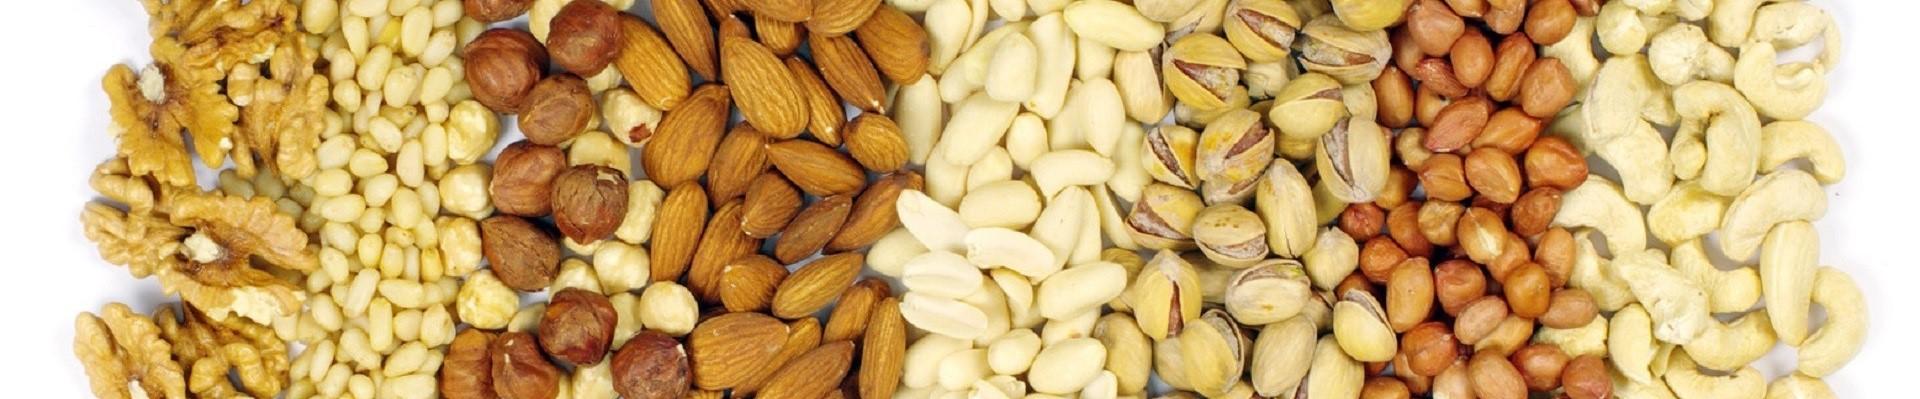 nuts-m-1920-399